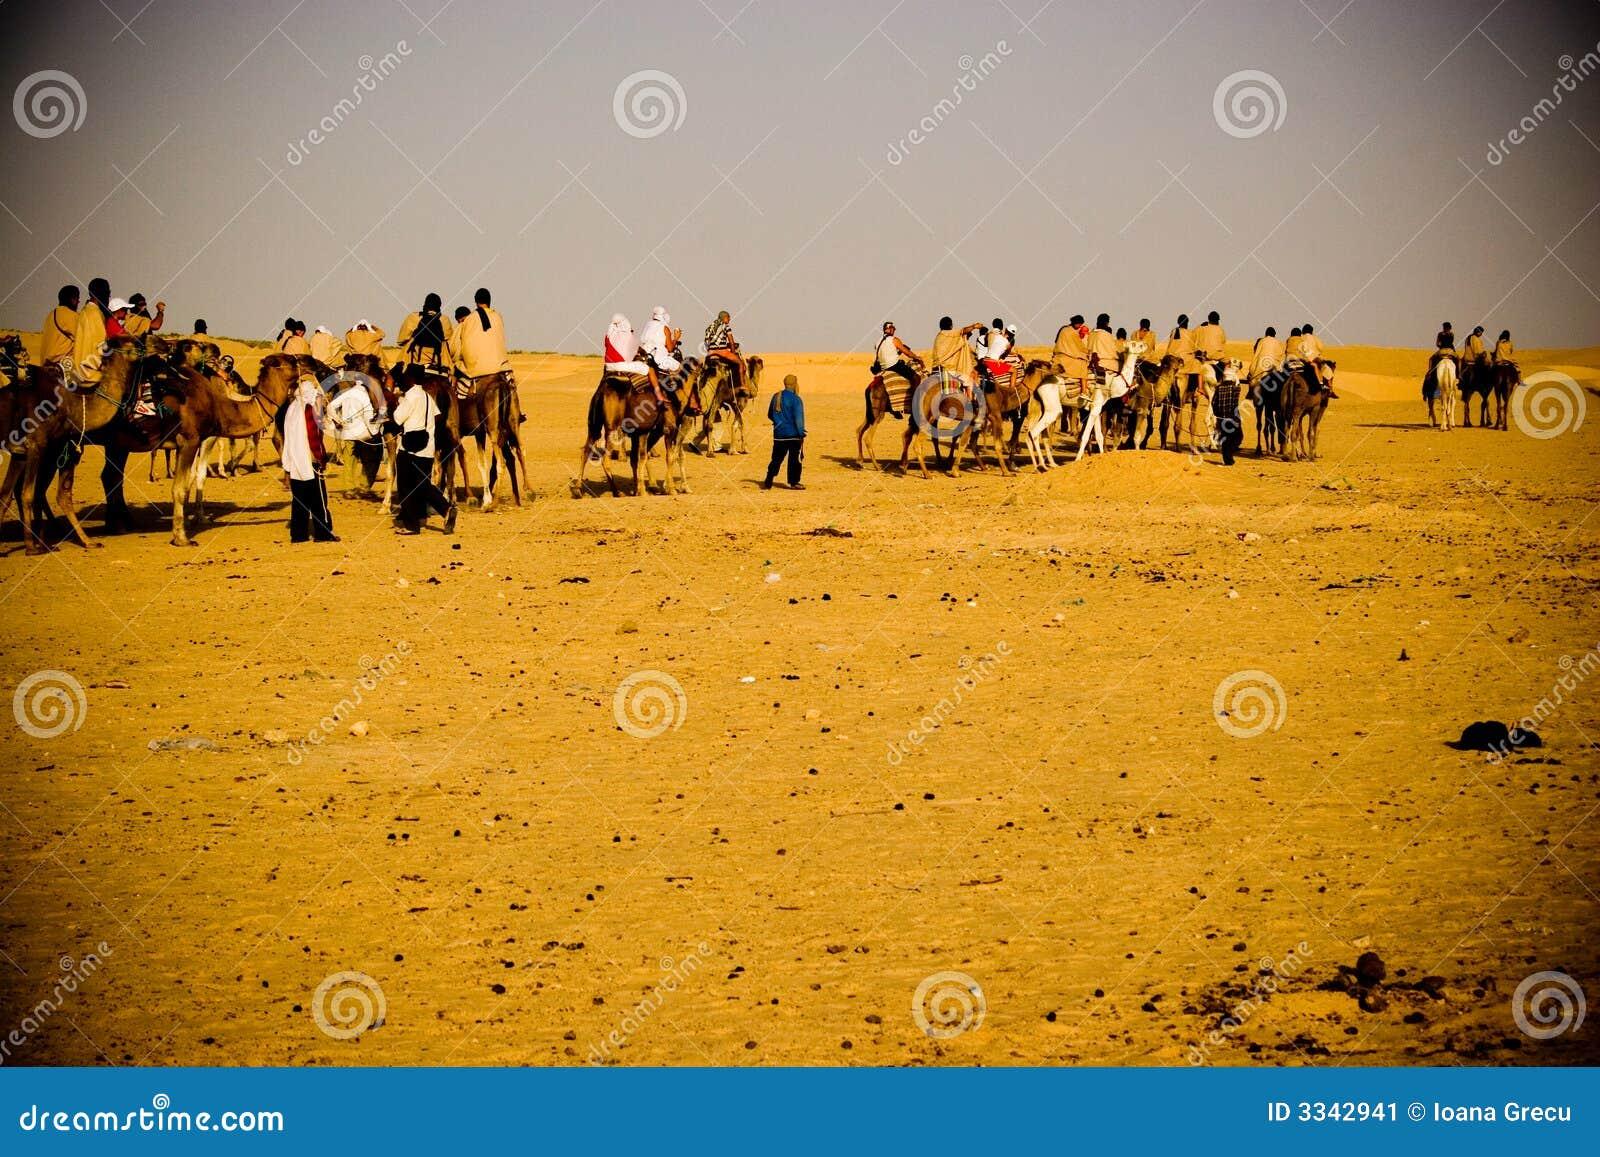 Desert Caravan Stock Image - Image: 3342941